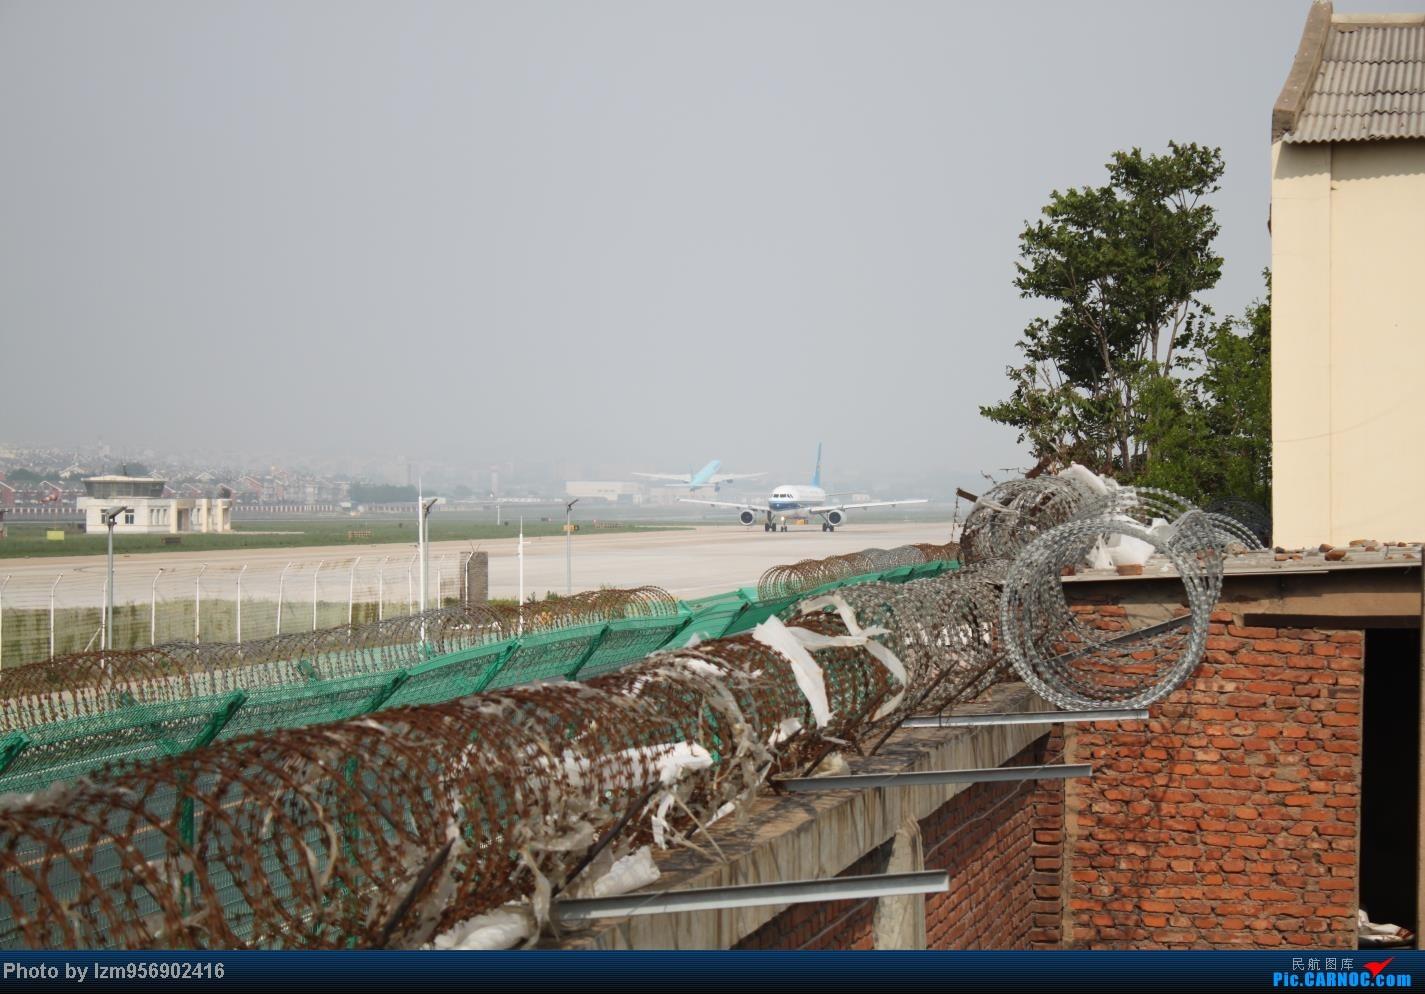 Re:[原创]DLC蹲点大半天,拍到了大棒航空772=w= AIRBUS A319-100 B-6020 中国大连周水子机场